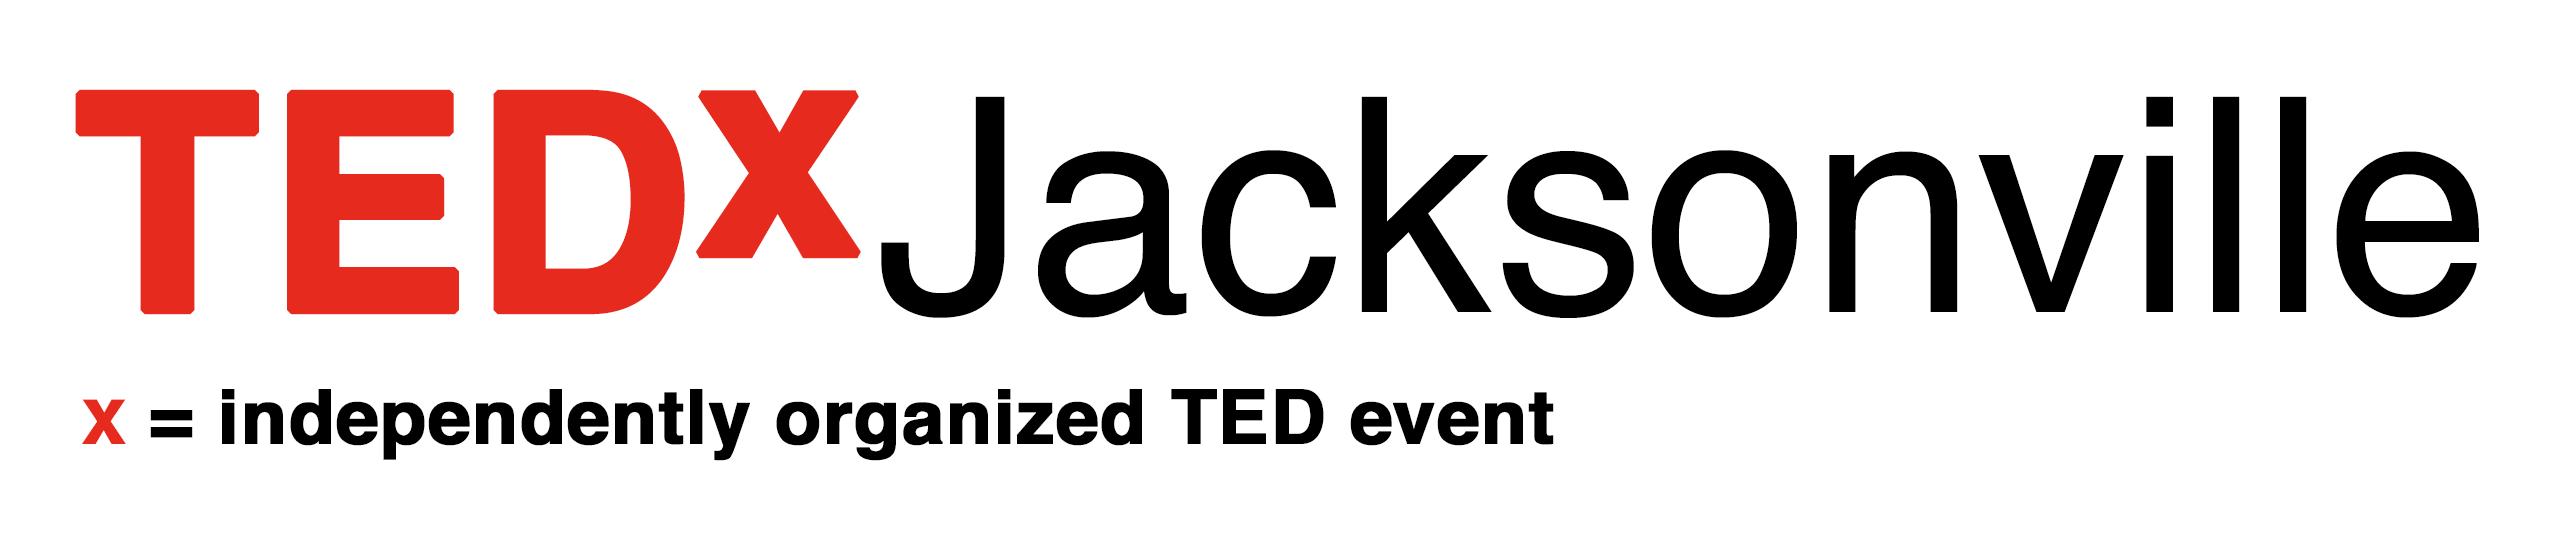 TEDxJacksonville in Jacksonville Florida